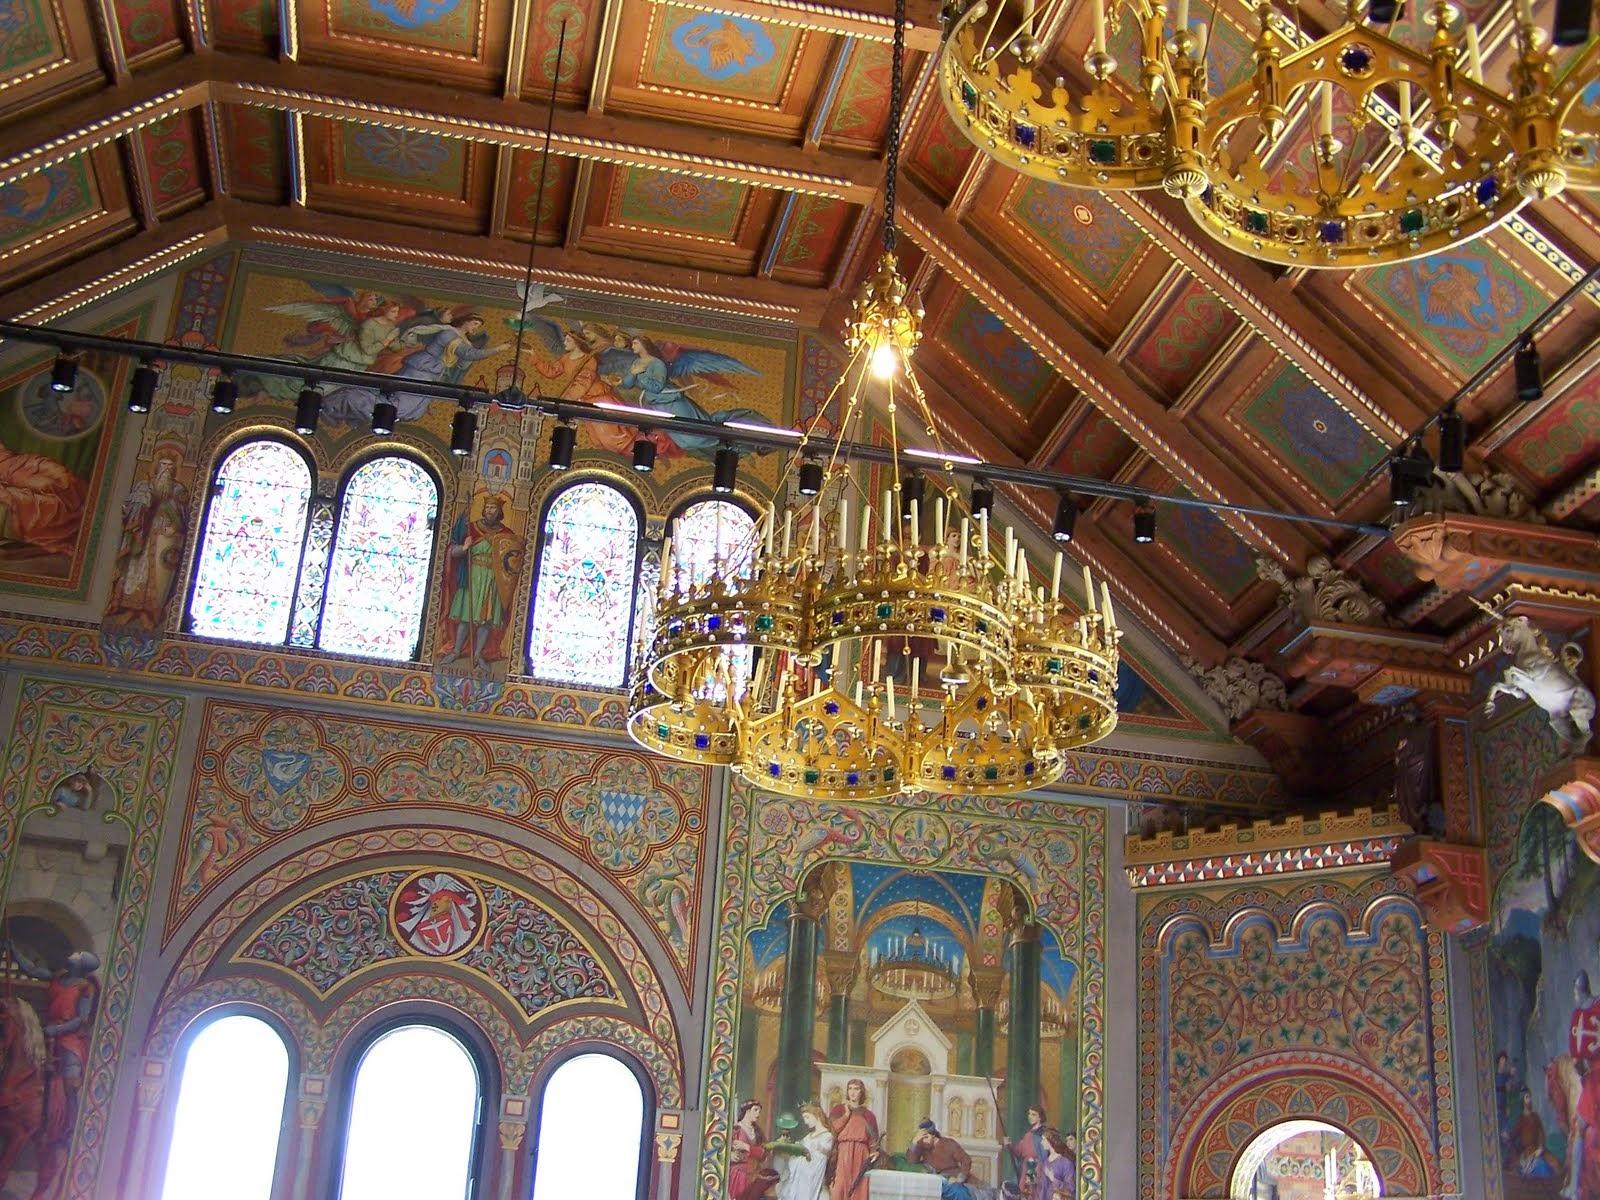 Neuschwanstein castle sngersaal singers hall sngersaal singers hall chandelier arubaitofo Image collections